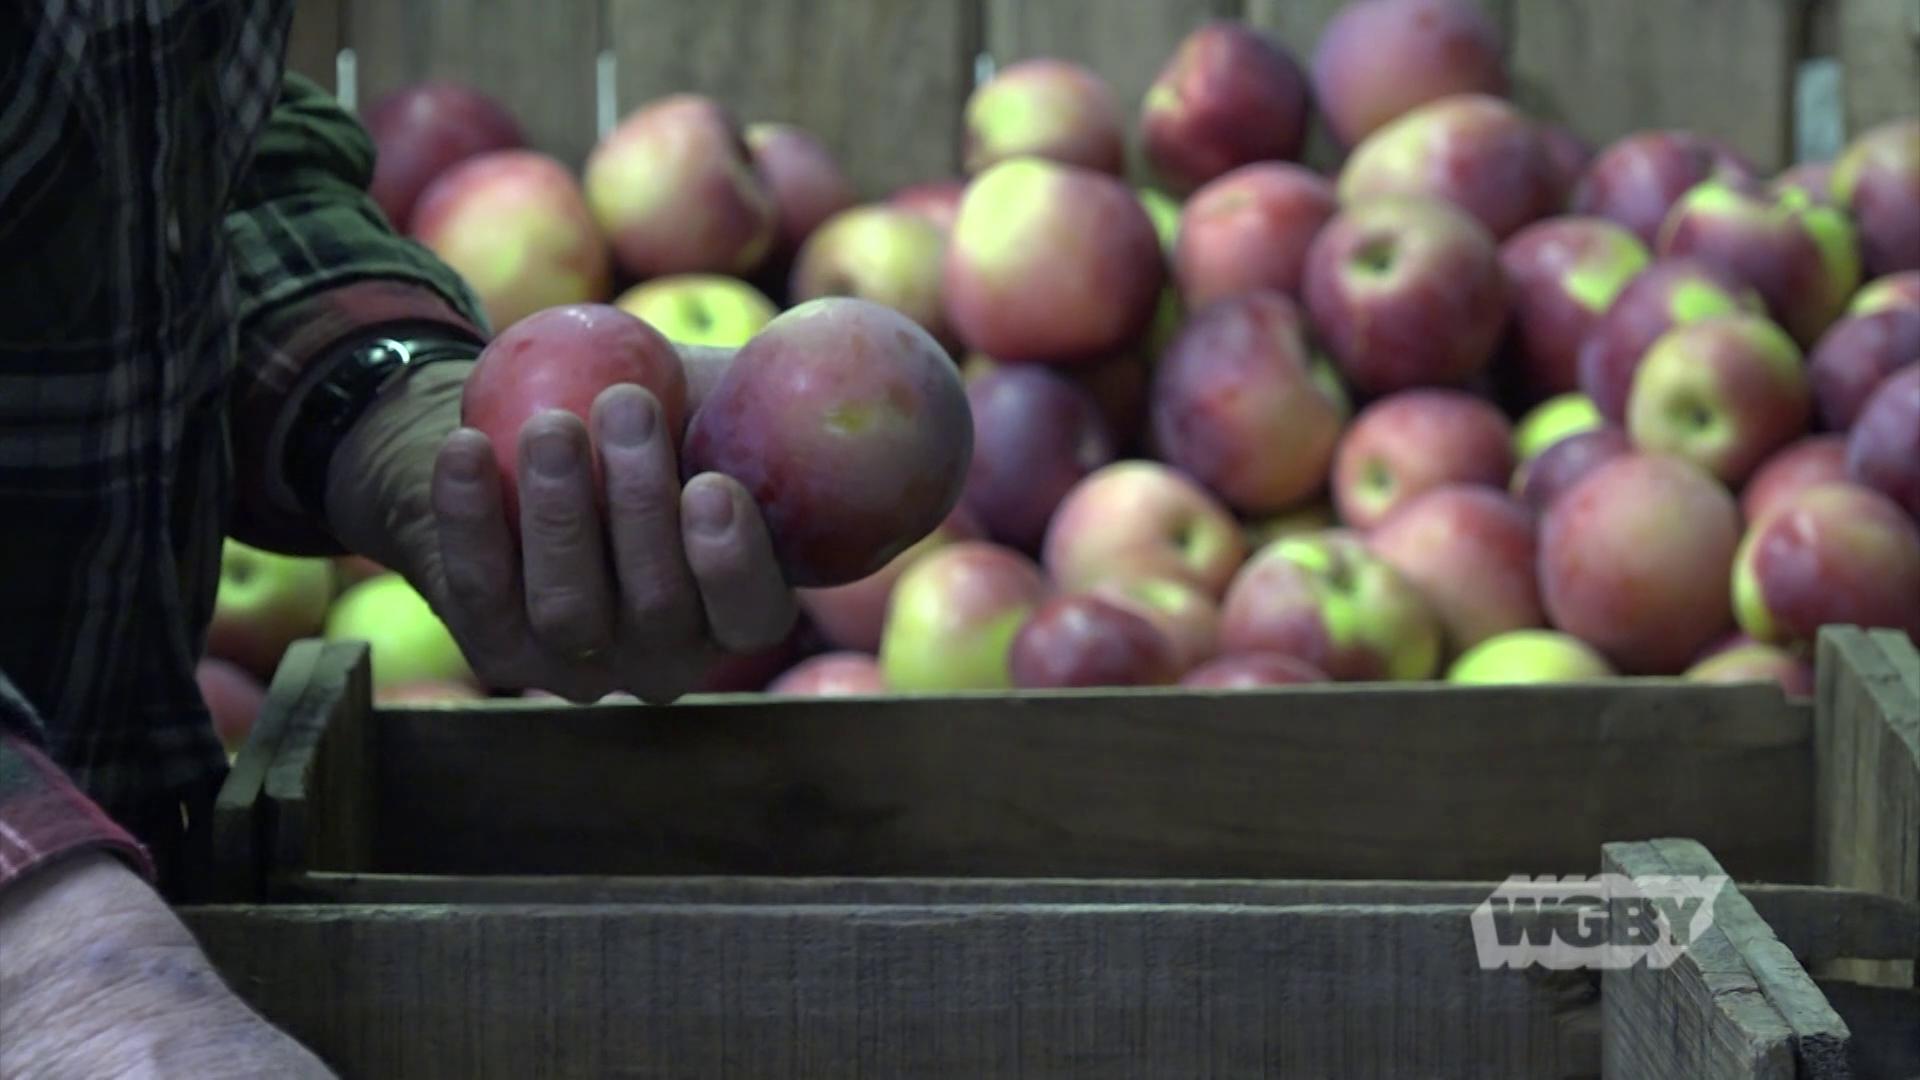 Winter Farmers Market, Pt.1: Meet the Farmers